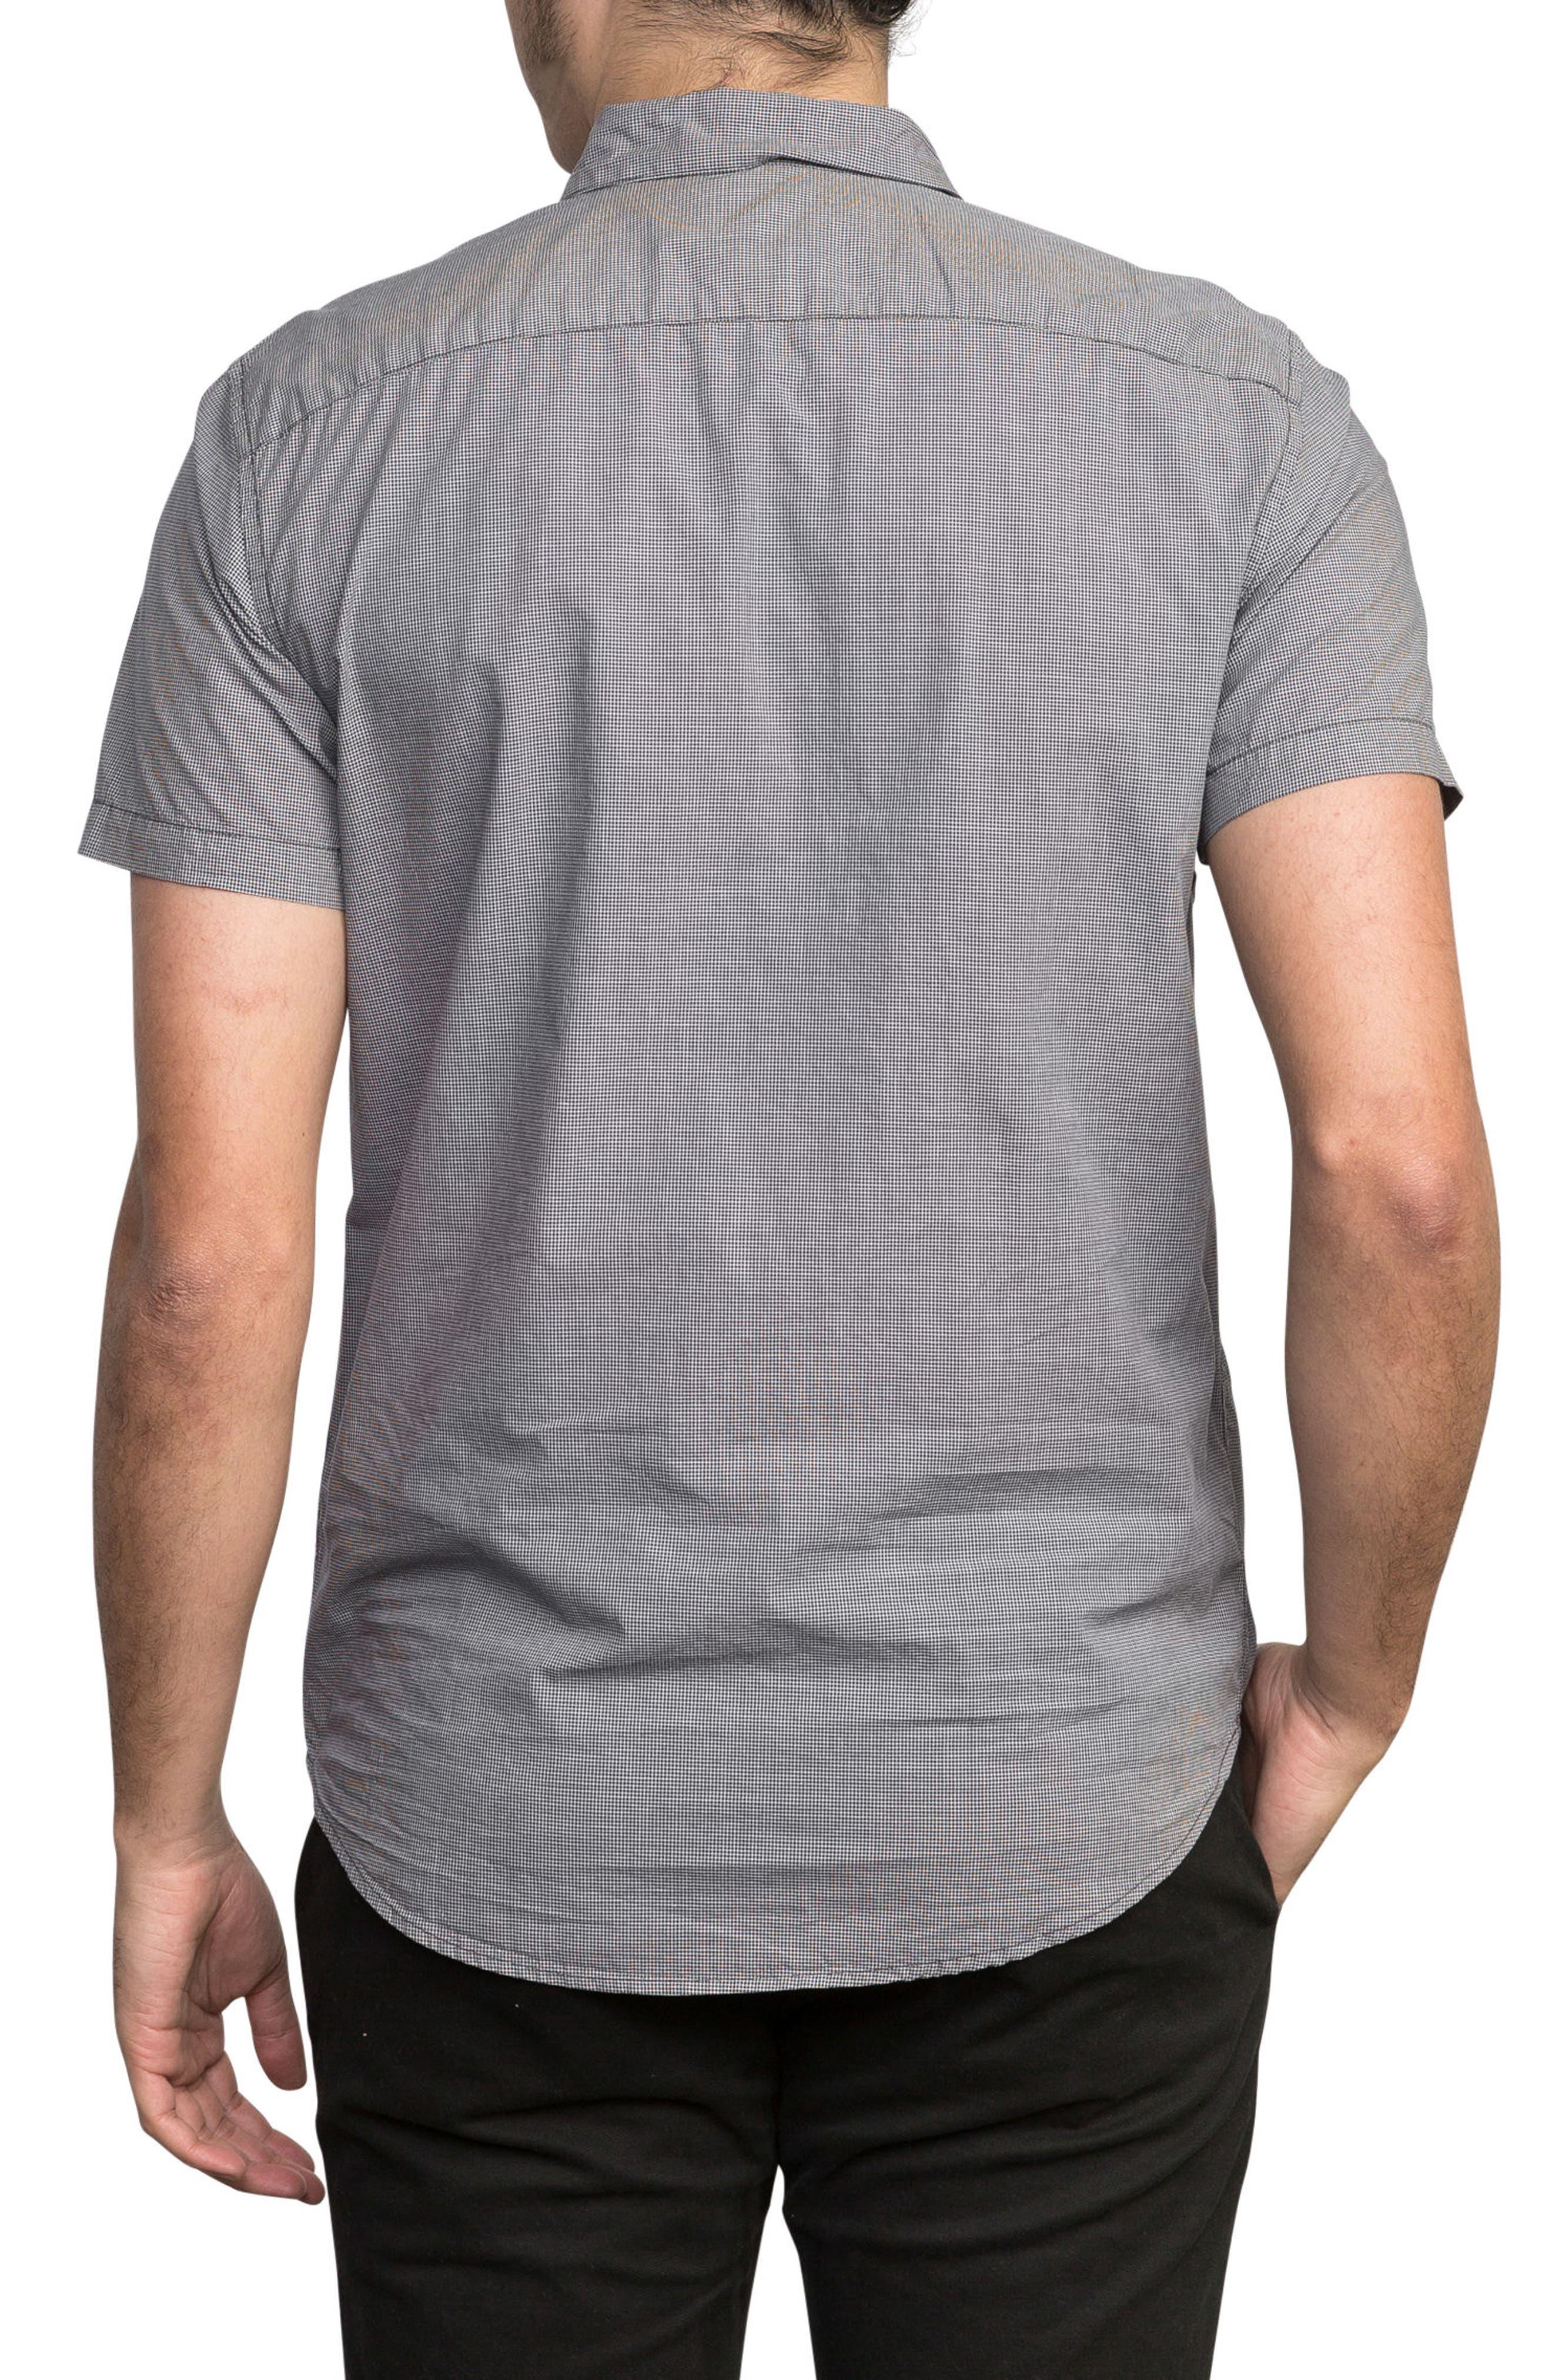 'That'll Do' Slim Fit Microdot Woven Shirt,                             Alternate thumbnail 2, color,                             Slate